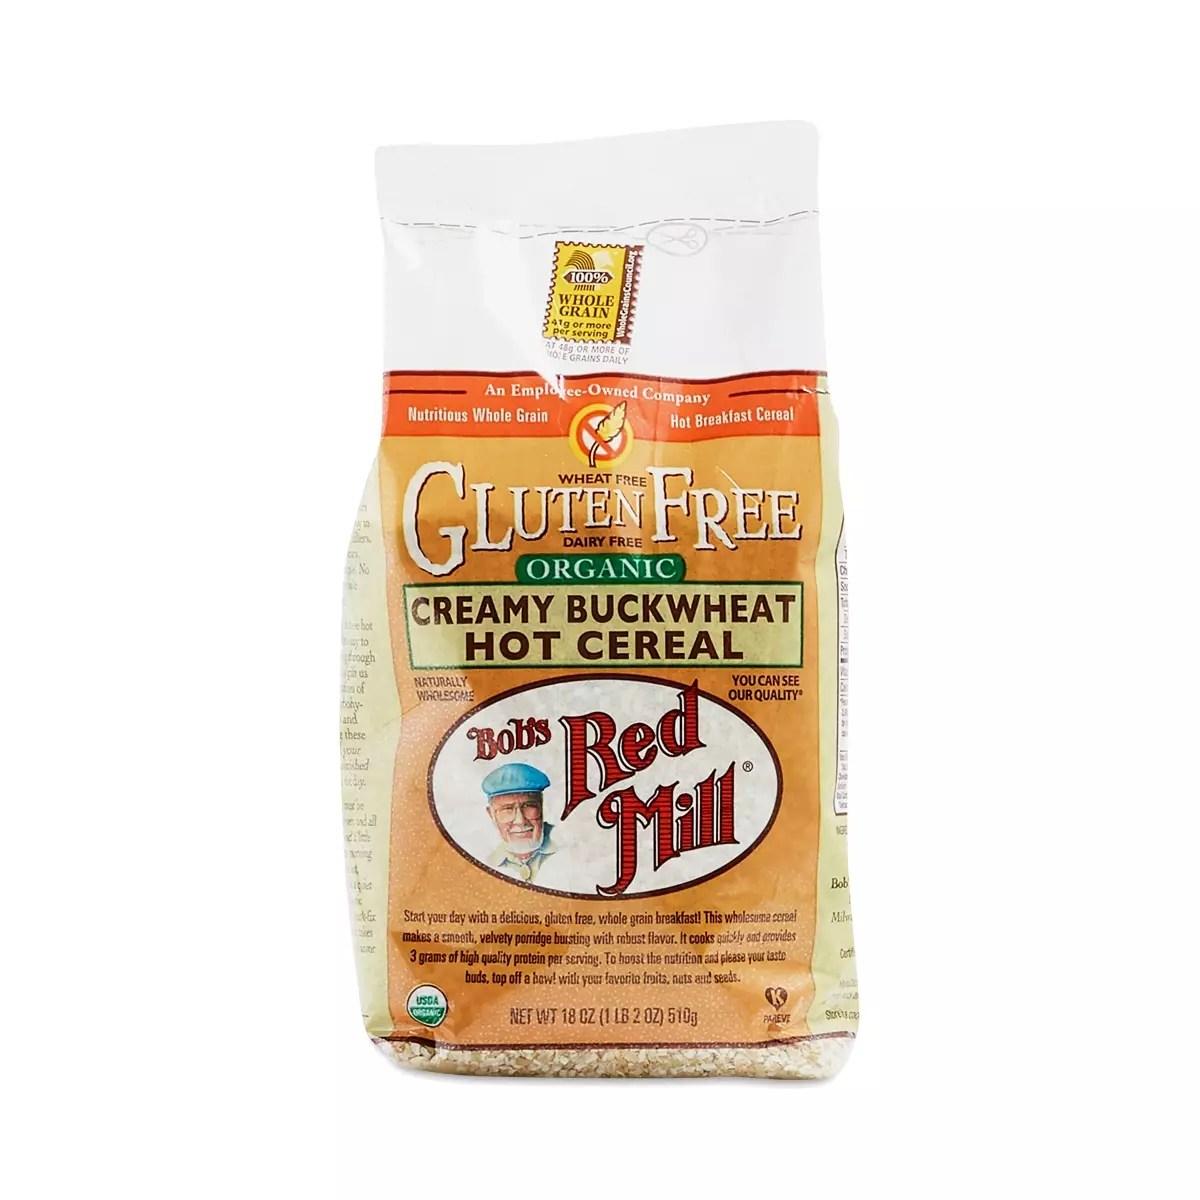 Bob's Red Mill Organic Creamy Buckwheat Hot Cereal ...